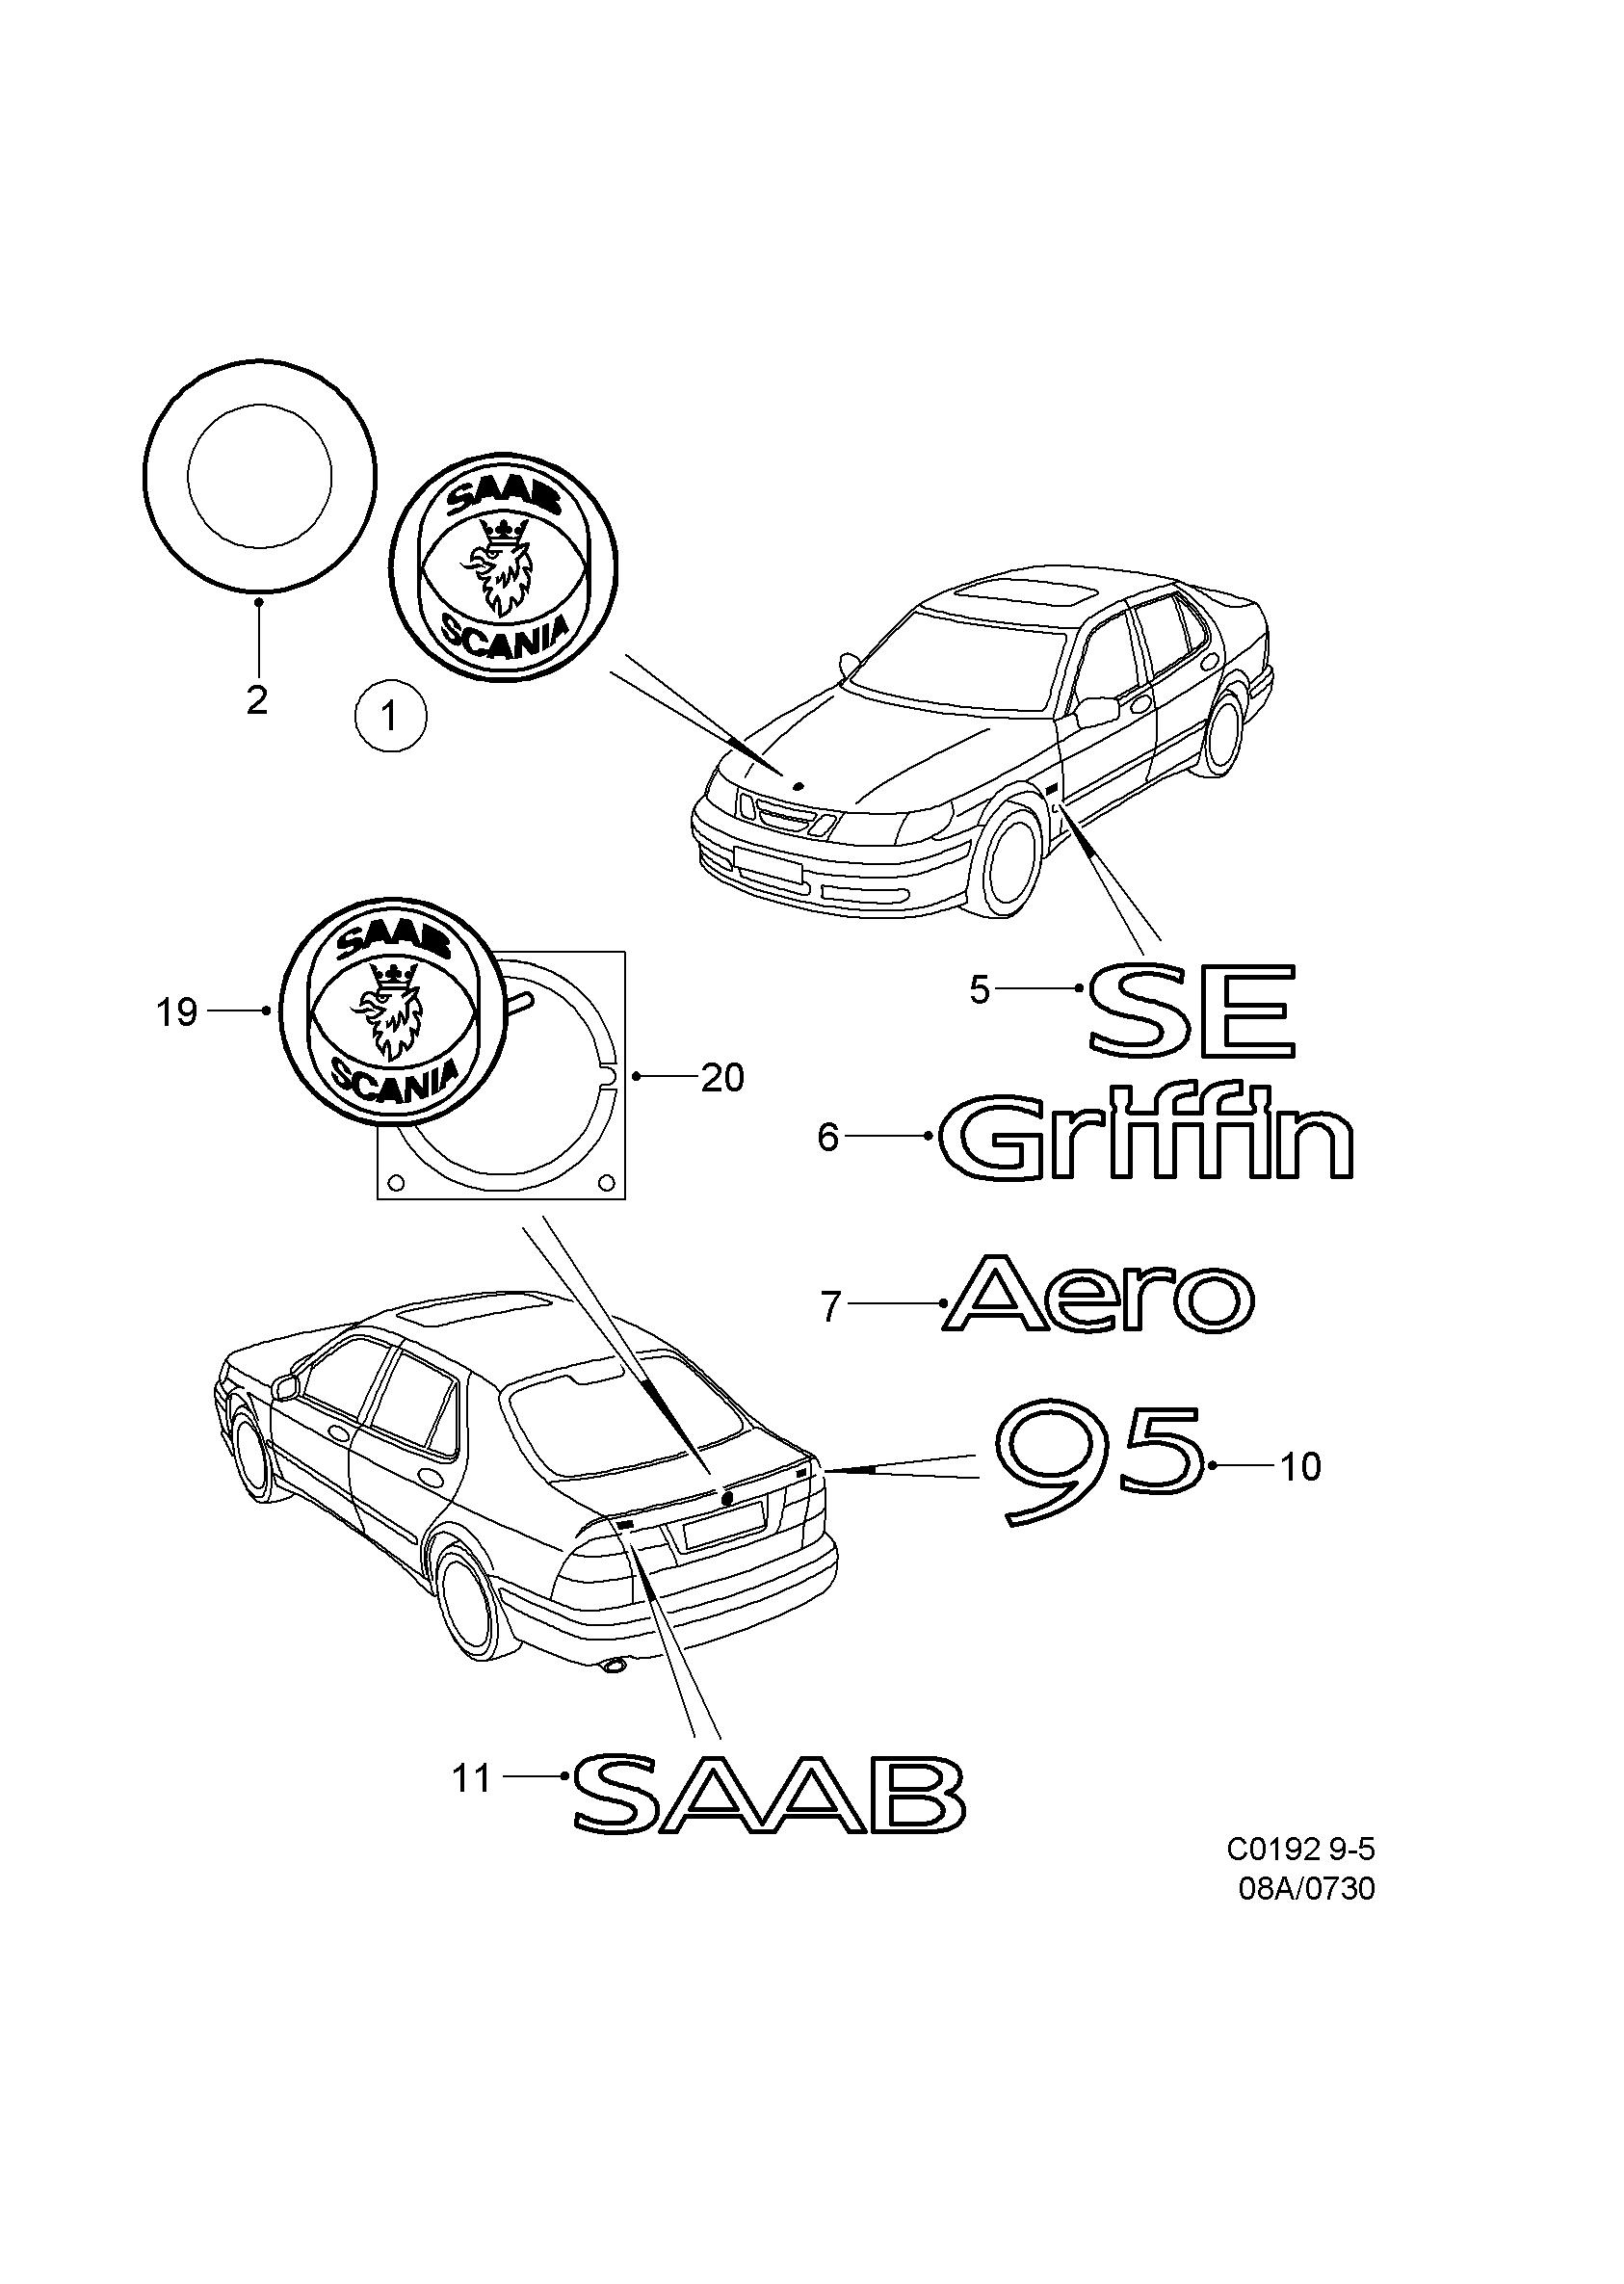 saab 9 5 9600 emblem 1998 2000 epc online nemiga 2001 Saab 9 5 Thermostat